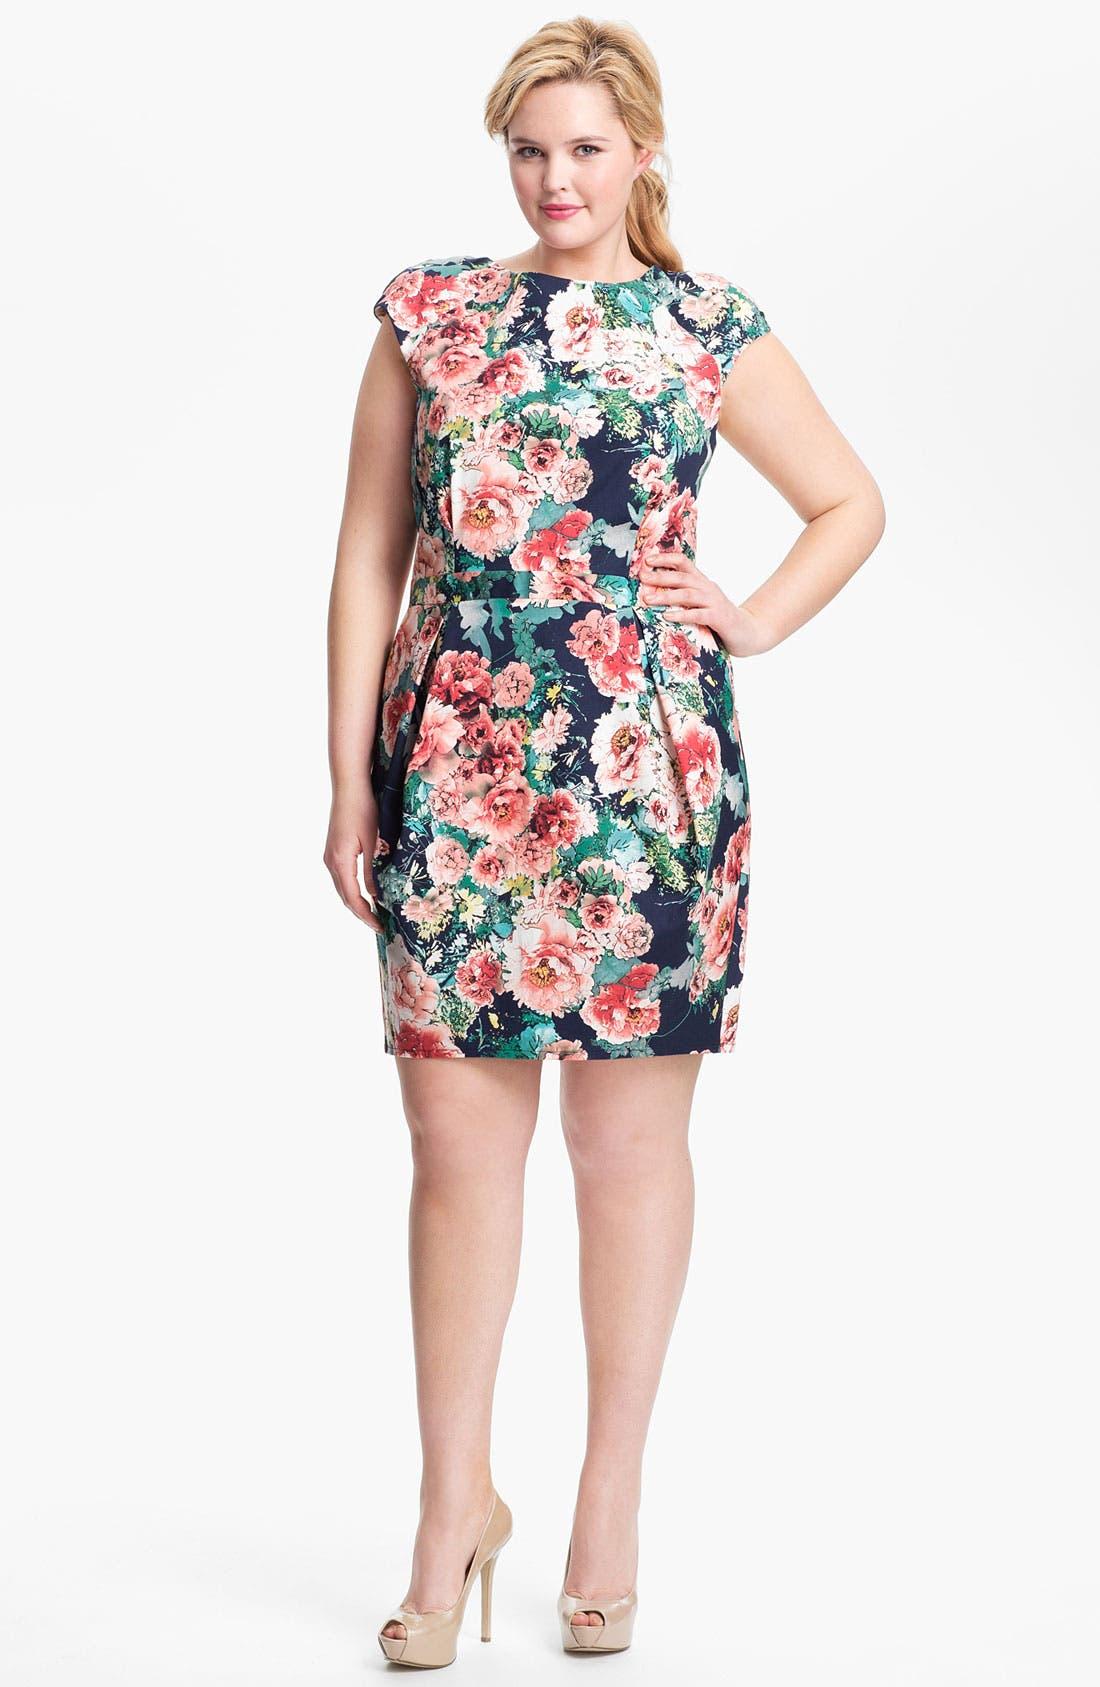 Main Image - A.B.S. by Allen Schwartz Print Sheath Dress (Plus Size) (Online Only)